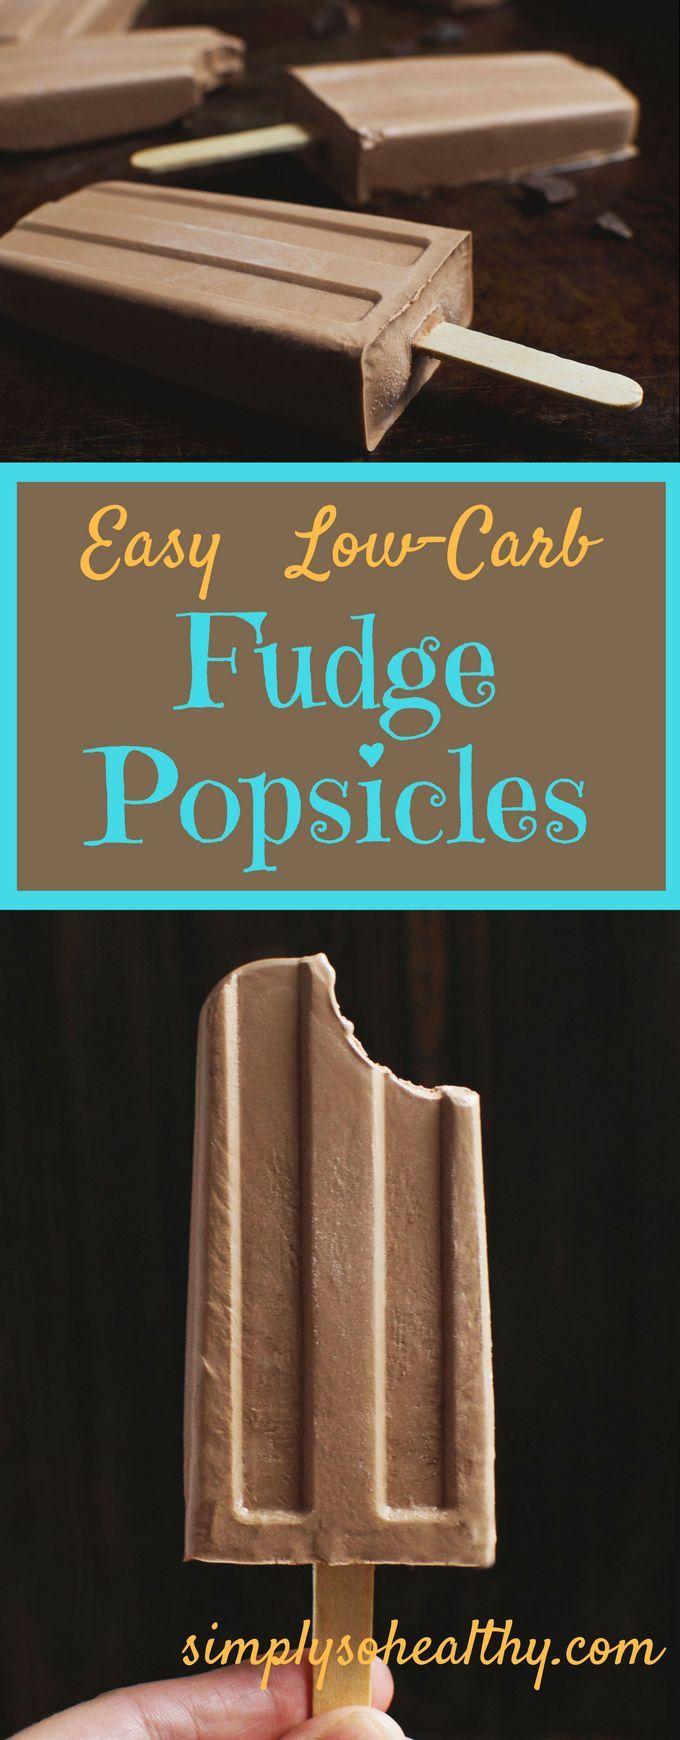 Easy Low Carb Fudge Popsicles Recipe Fudge Popsicles Low Carb